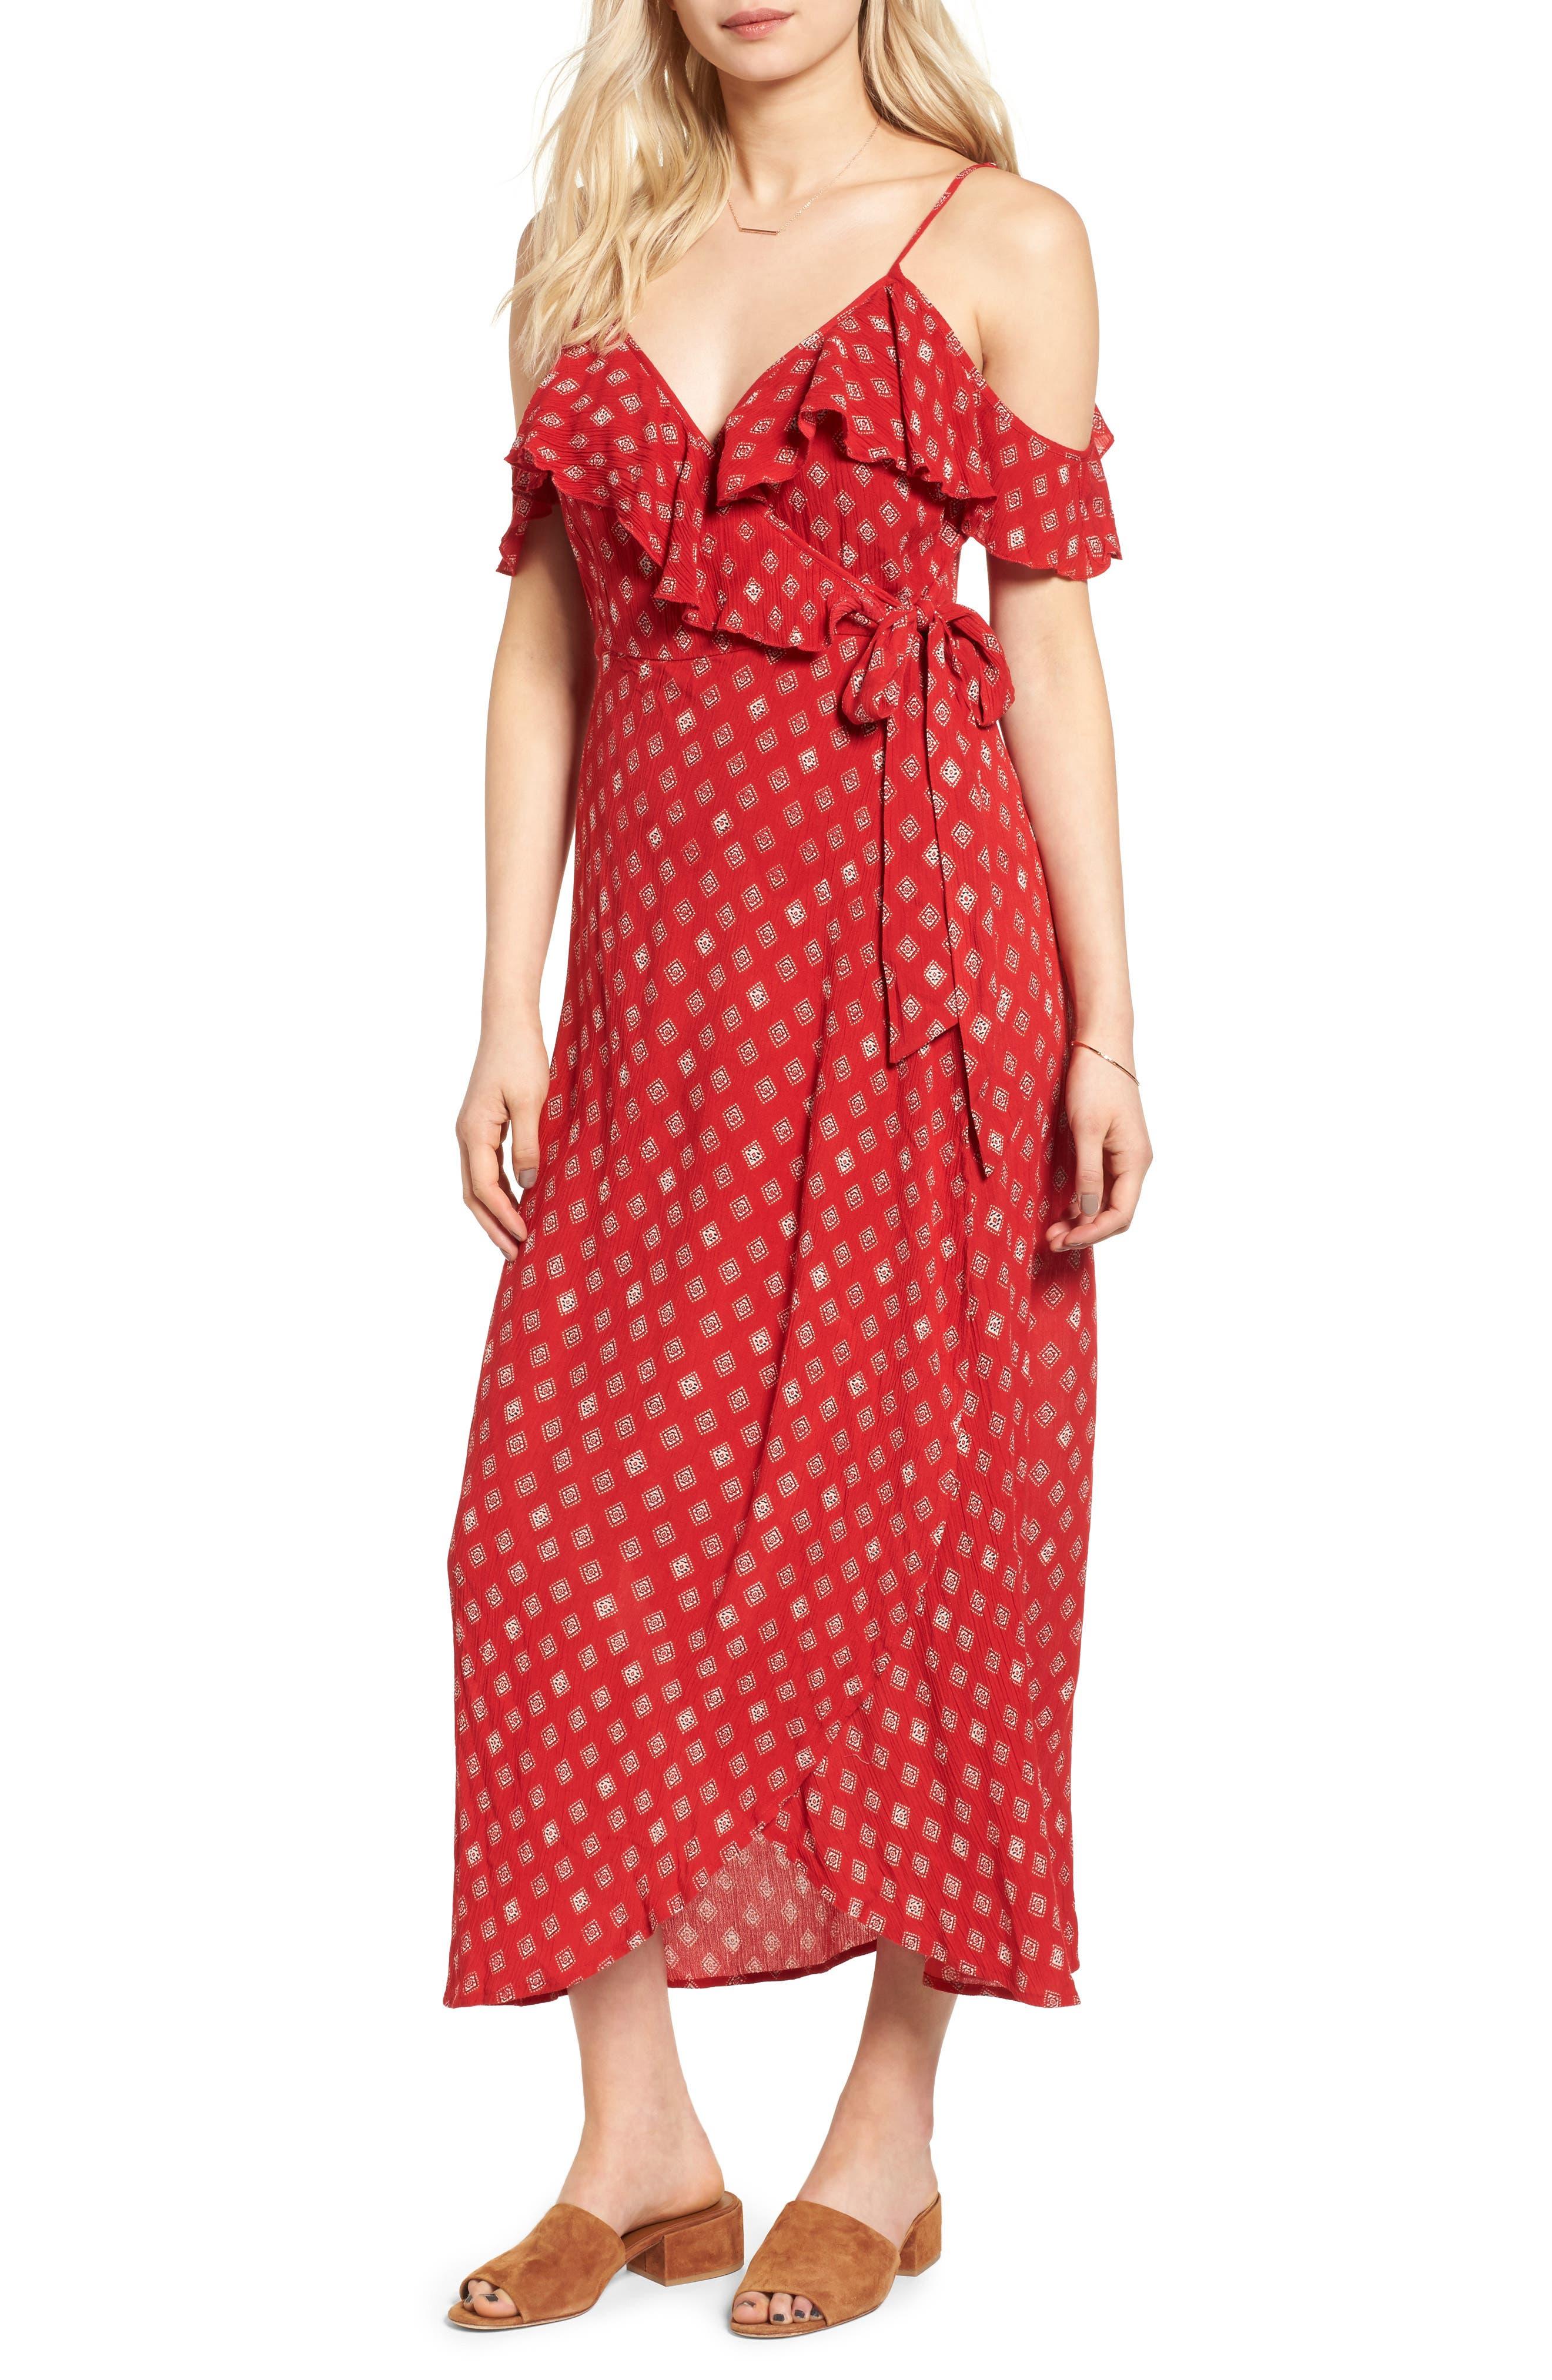 Alternate Image 1 Selected - Band of Gypsies Foulard Cold Shoulder Dress